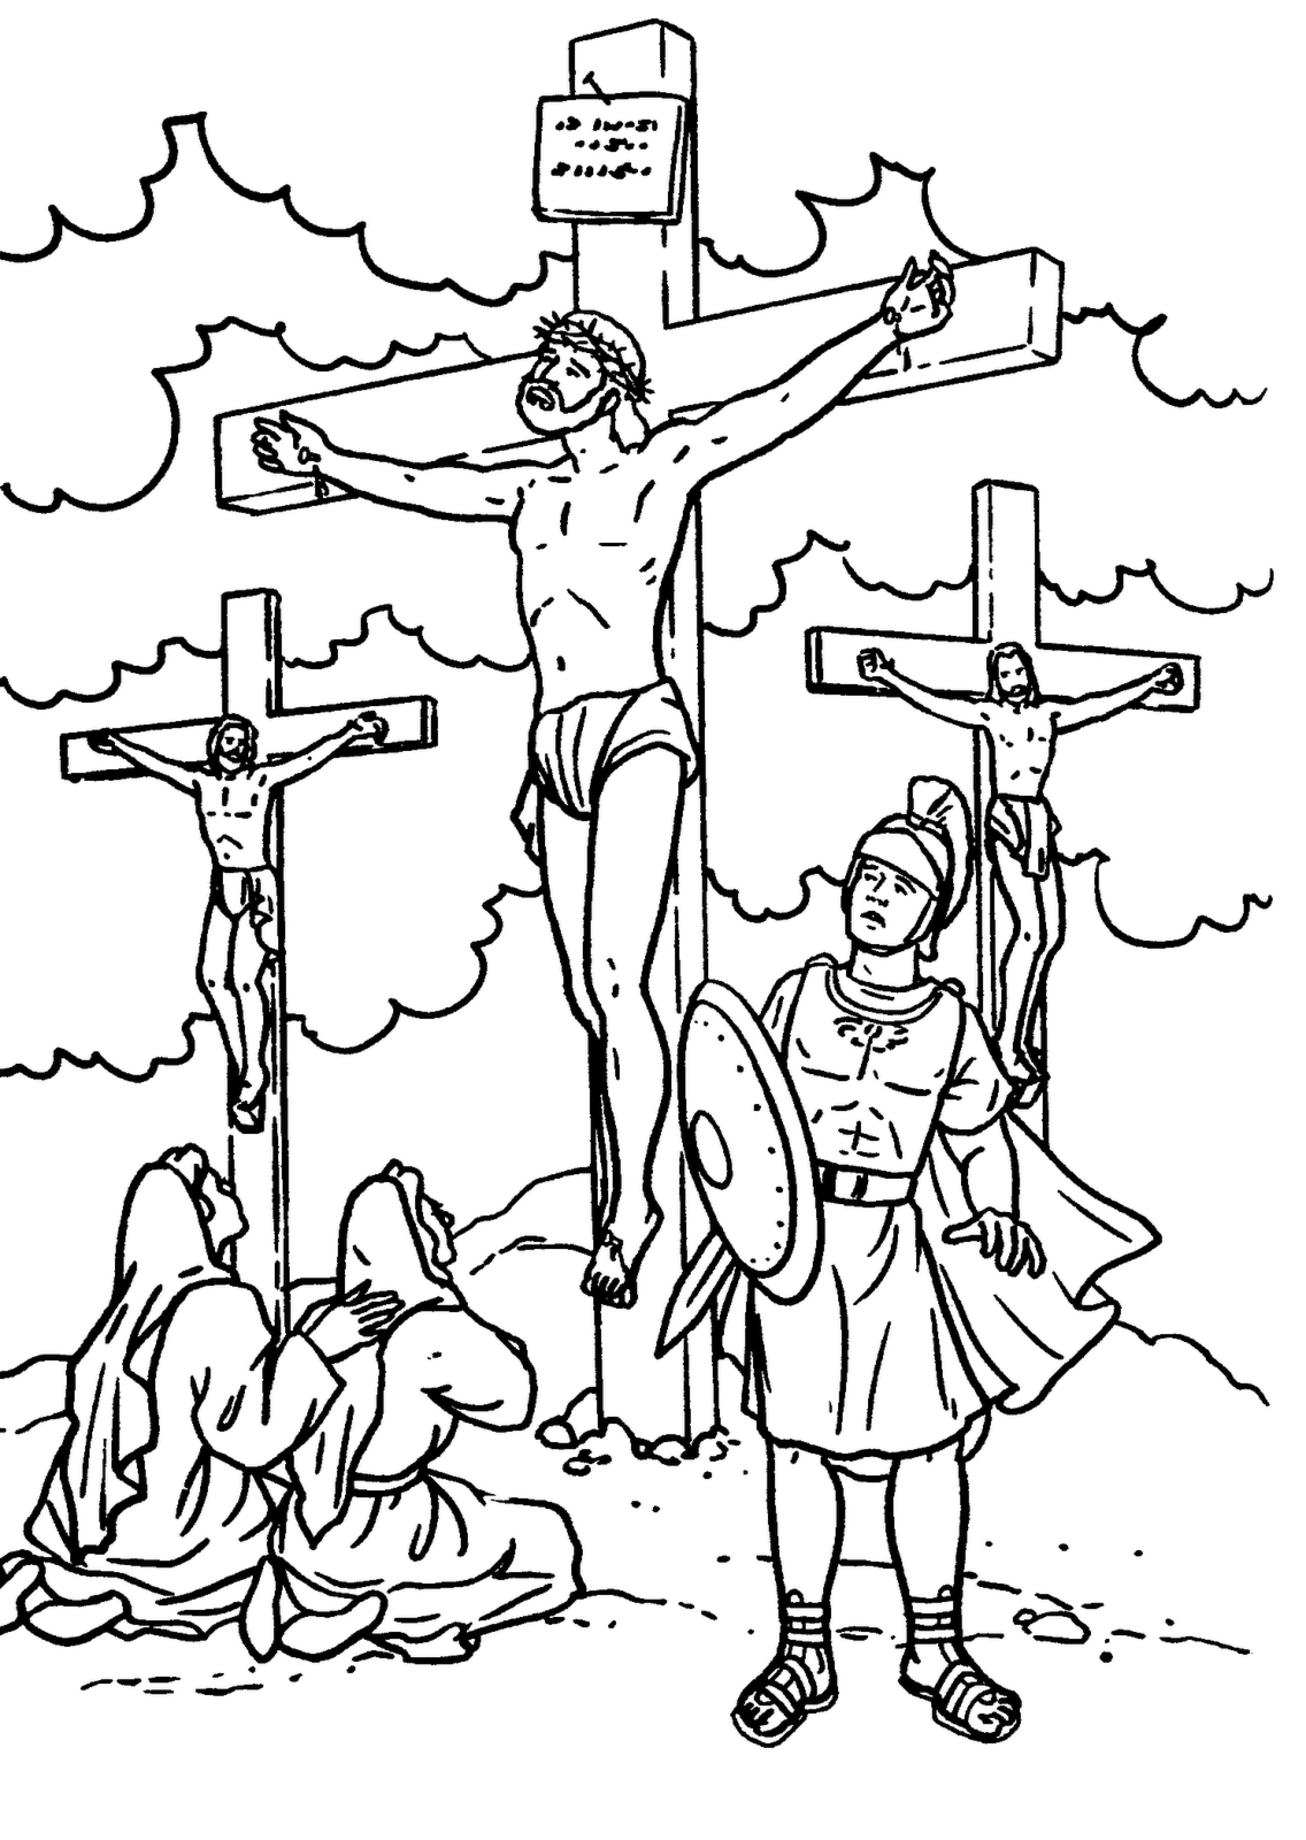 coloring pictures of jesus crucifixion 2012 03 11 free christian wallpapers crucifixion of coloring pictures jesus